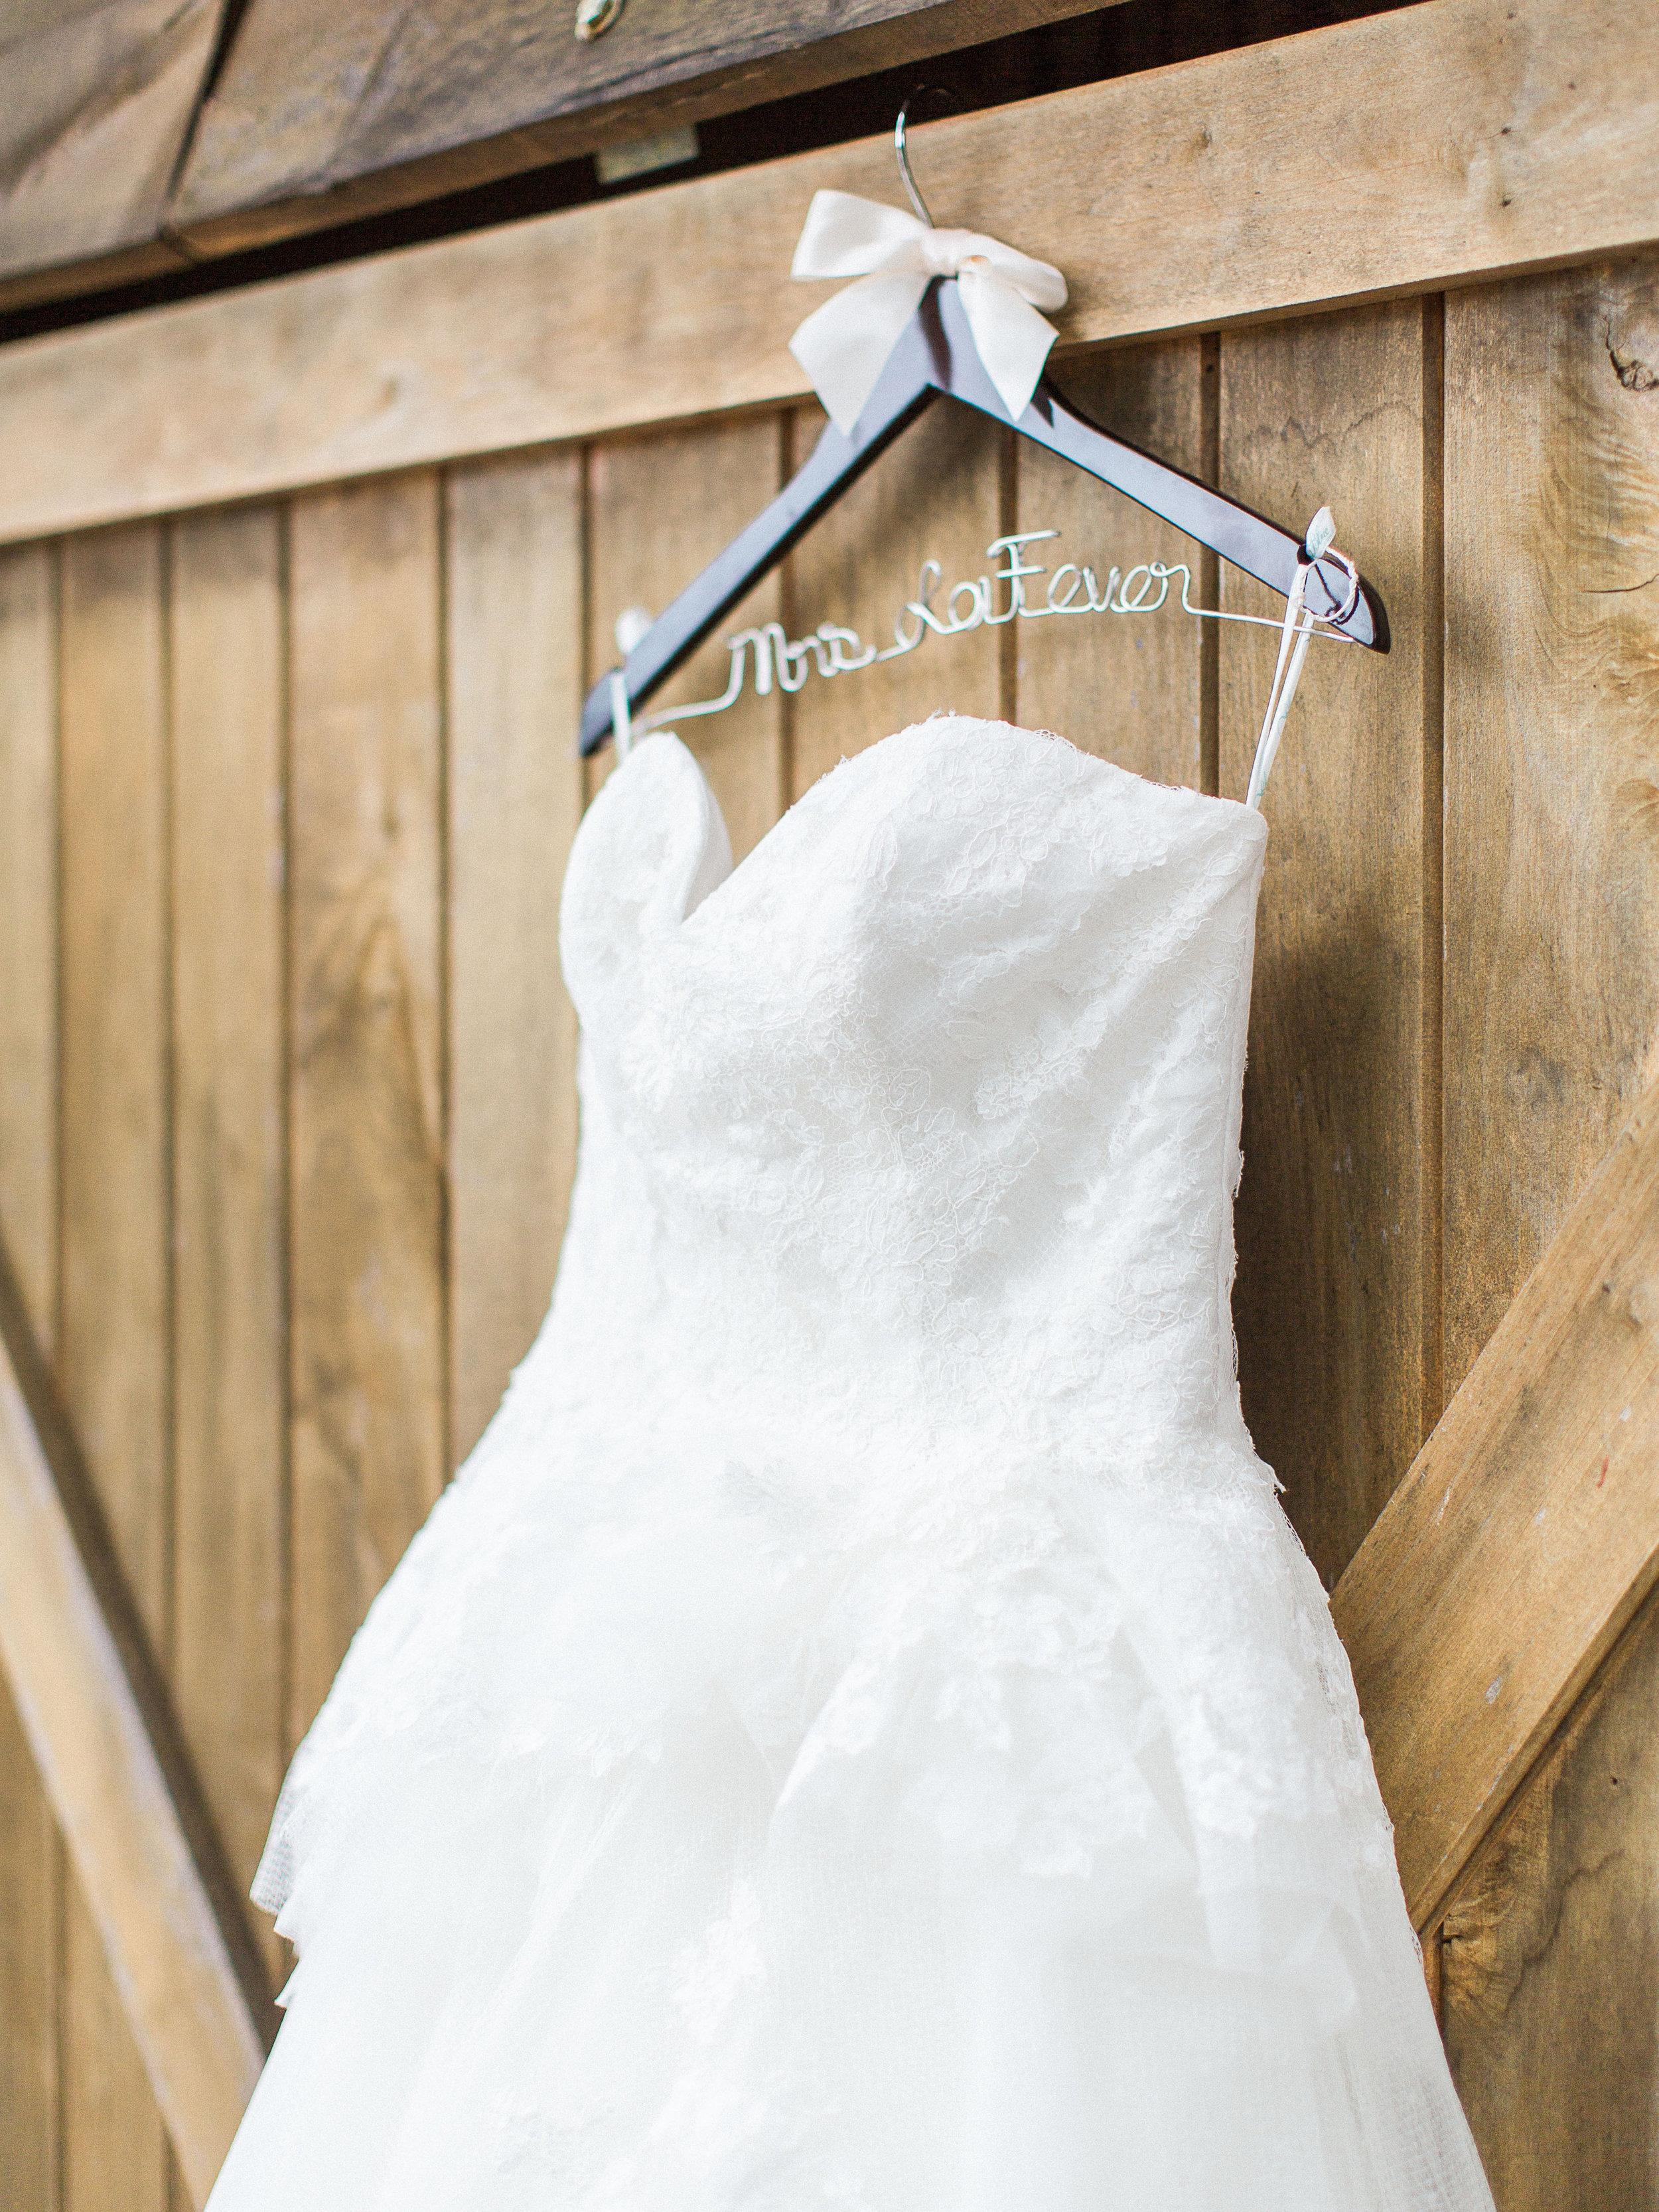 ERIC AND HALLIE WEDDING-HI RESOLUTION FOR PRINTING-0066.jpg